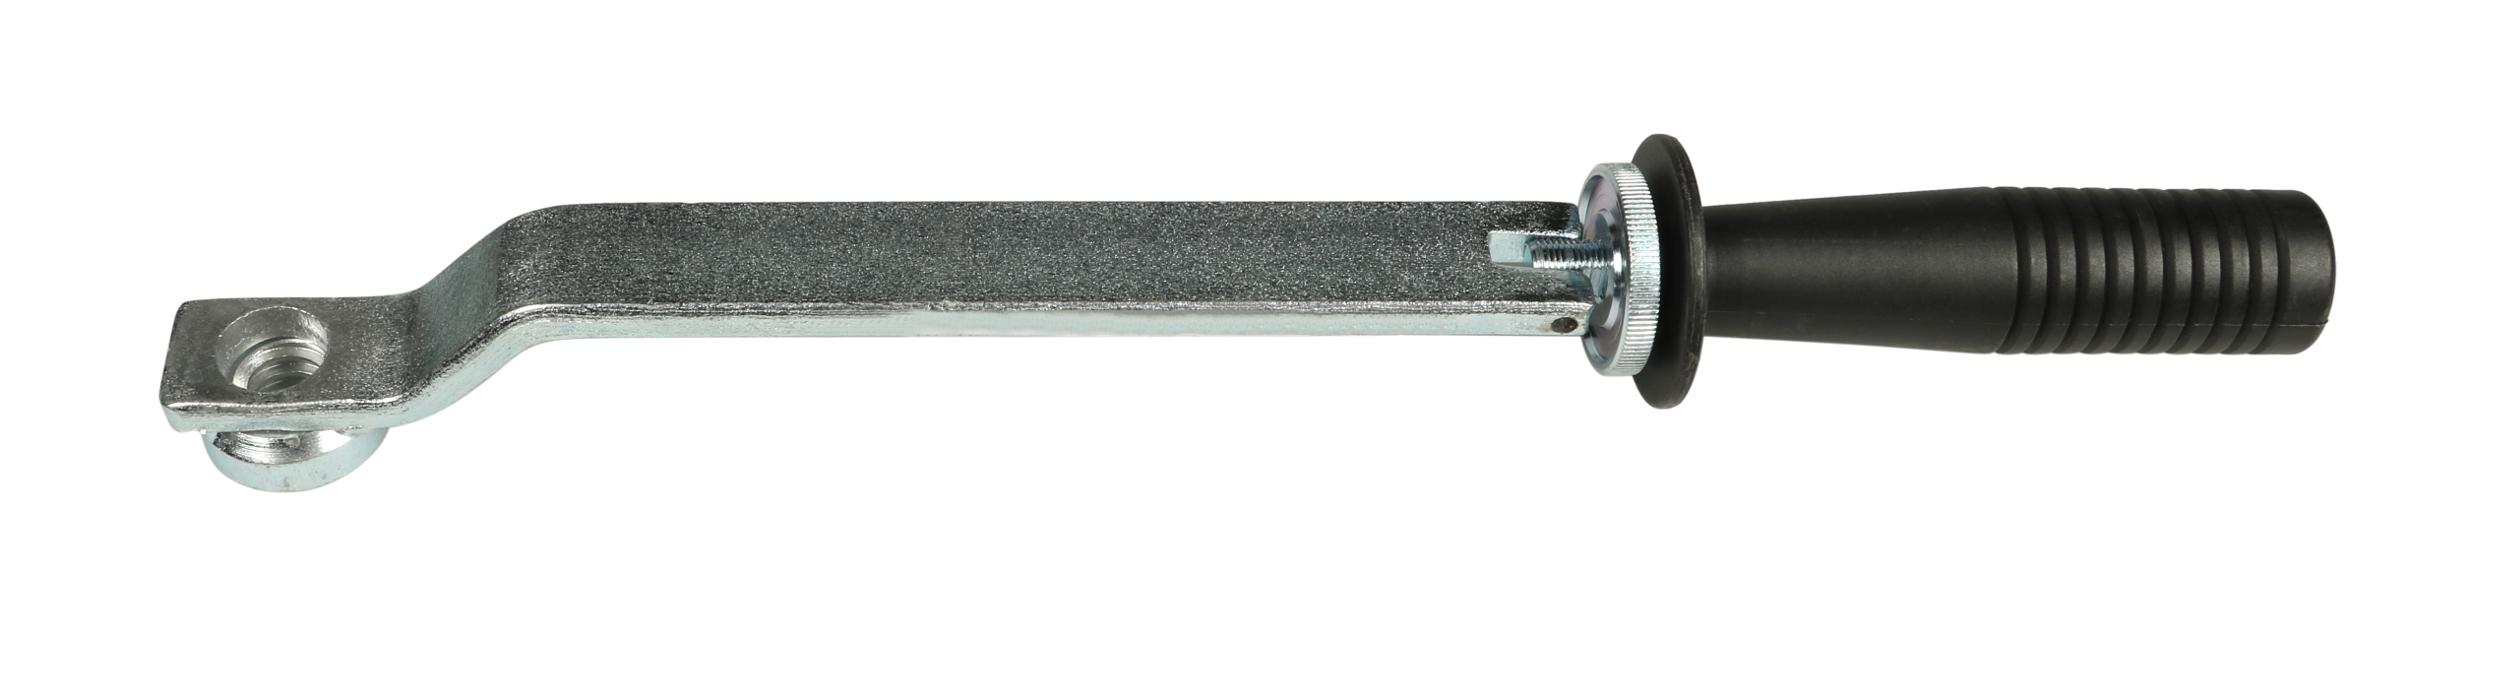 Global Truss ST-132/HANDLE Crank Handle for ST-132 ST132/HANDLE